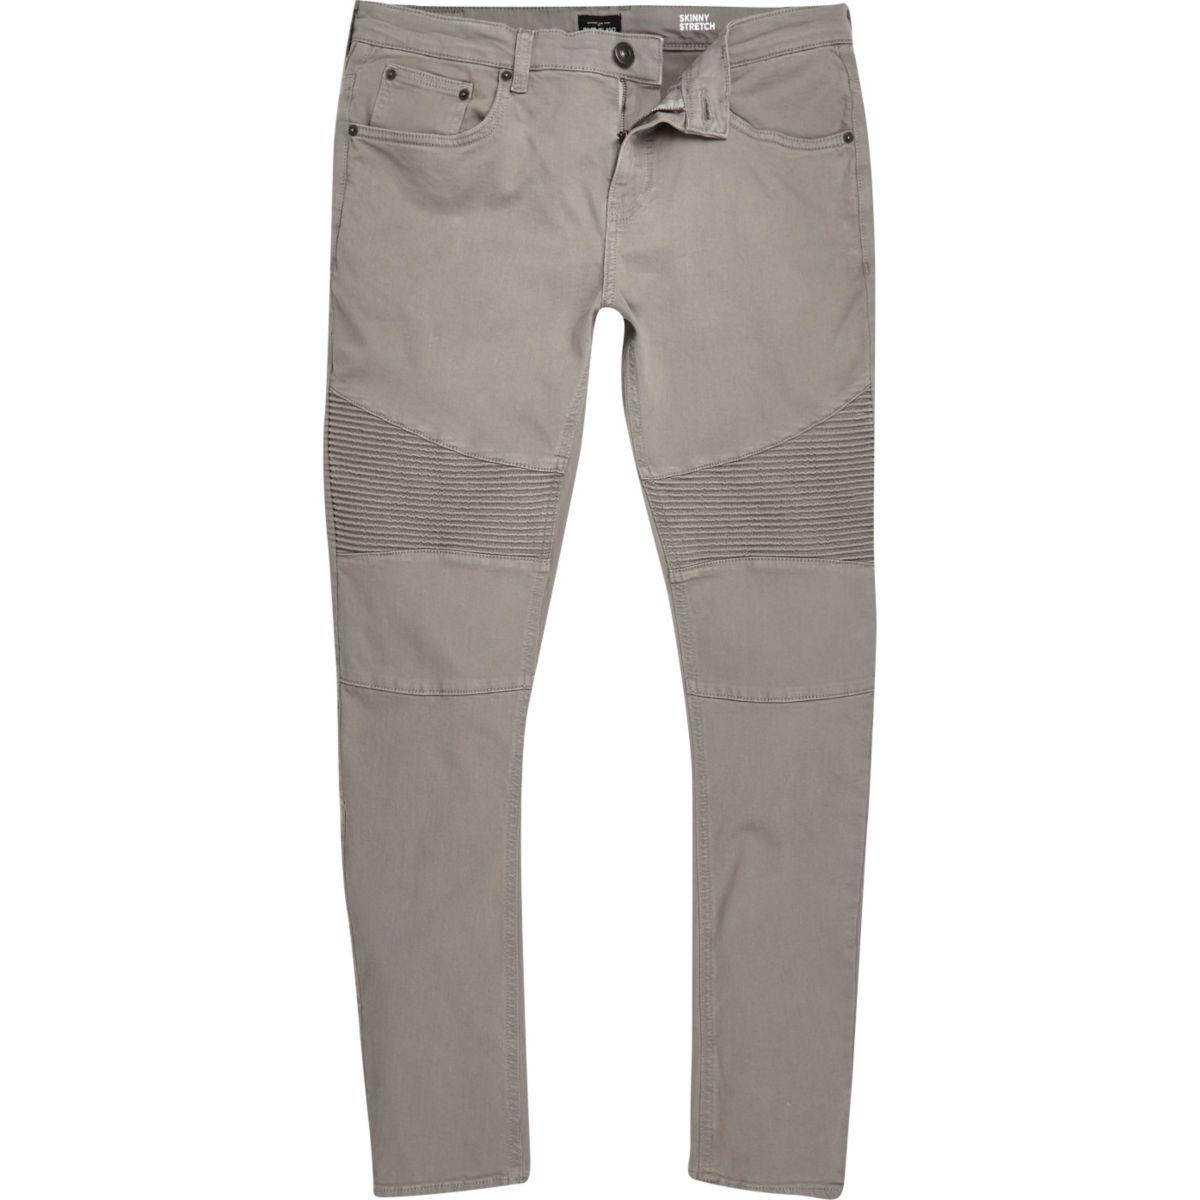 Light grey Sid skinny biker jeans